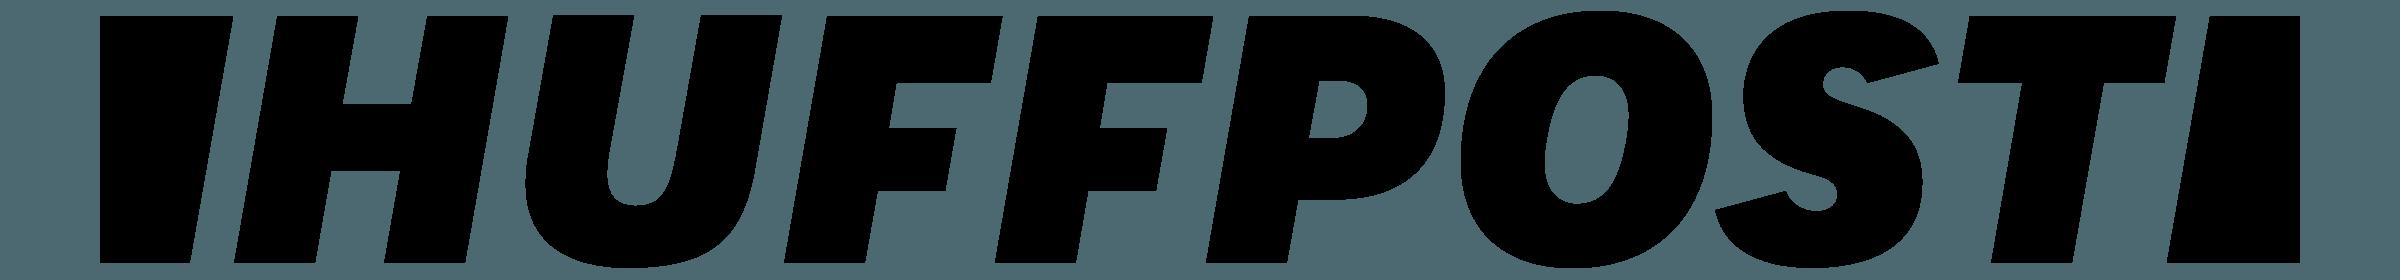 huffpost-logo-black-transparent.png